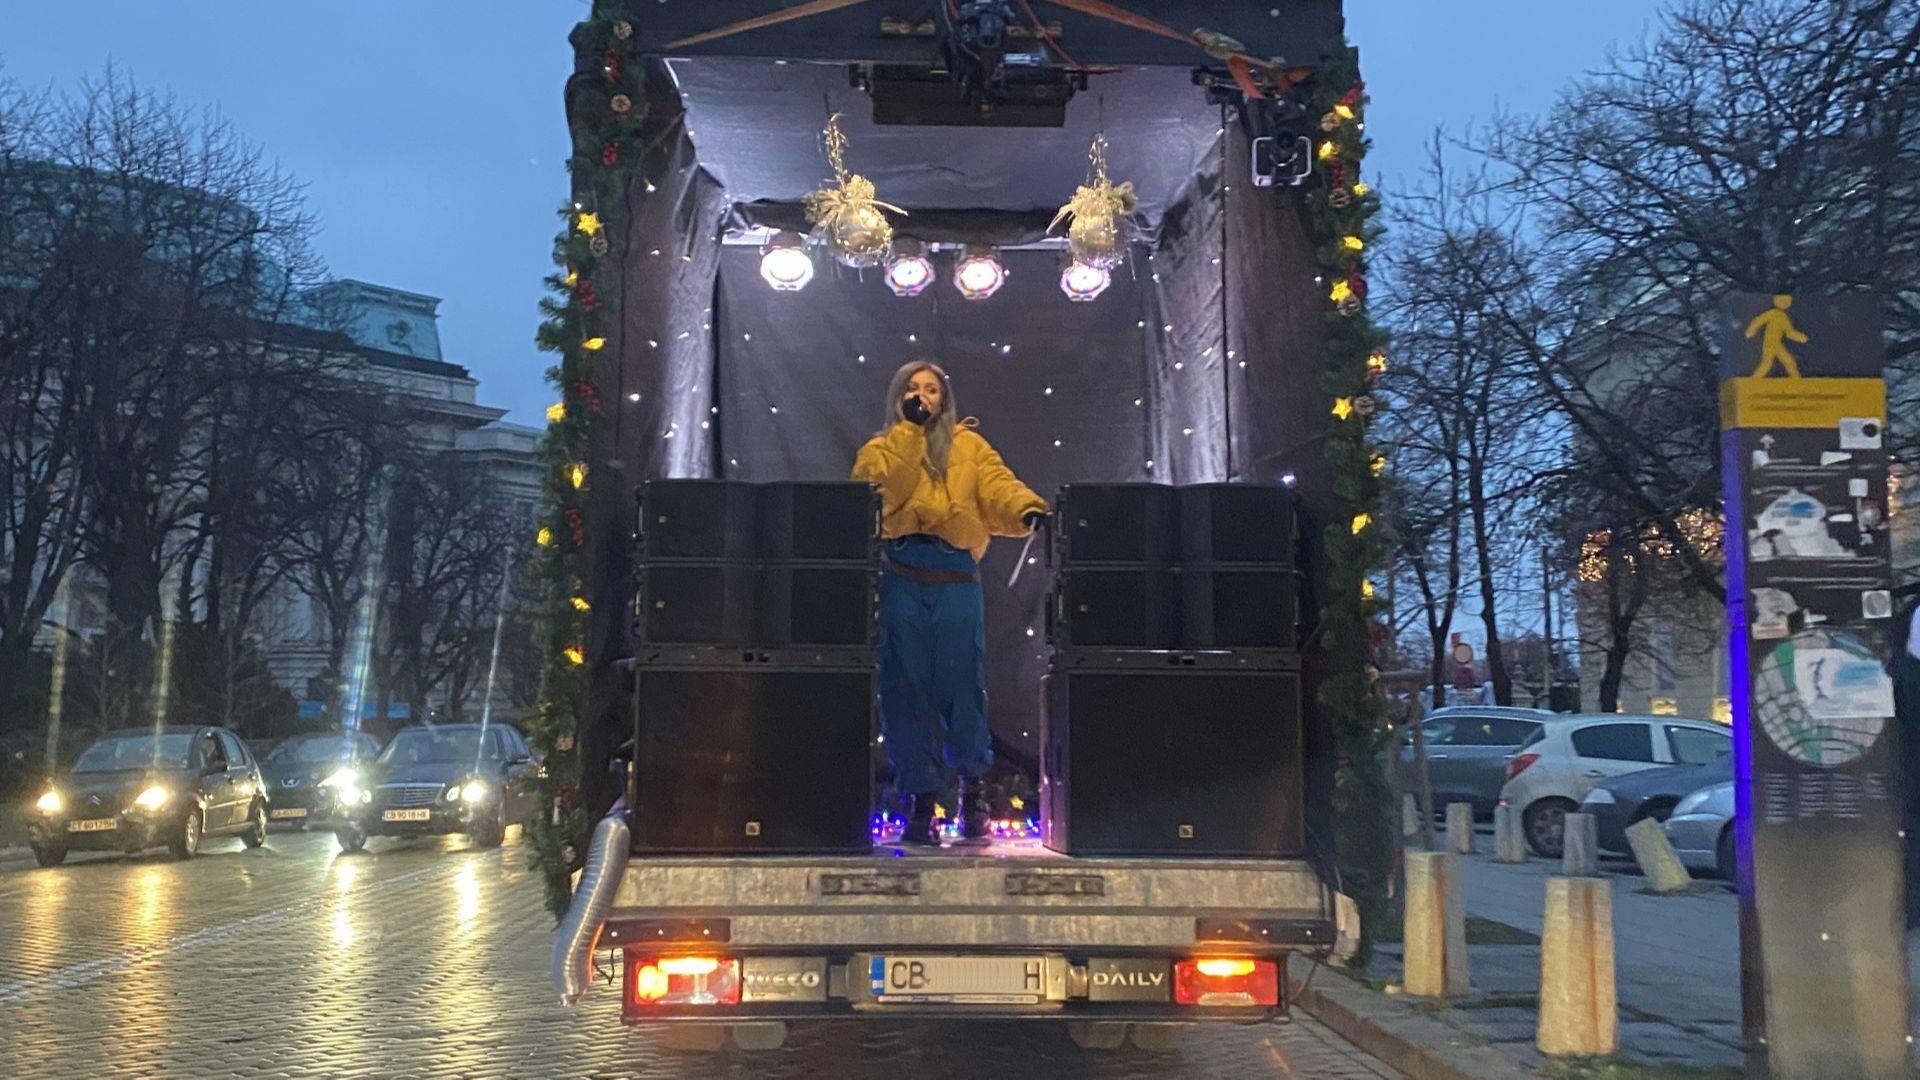 Виктория донесе коледно настроение в София с нетрадиционен концерт из улиците на града